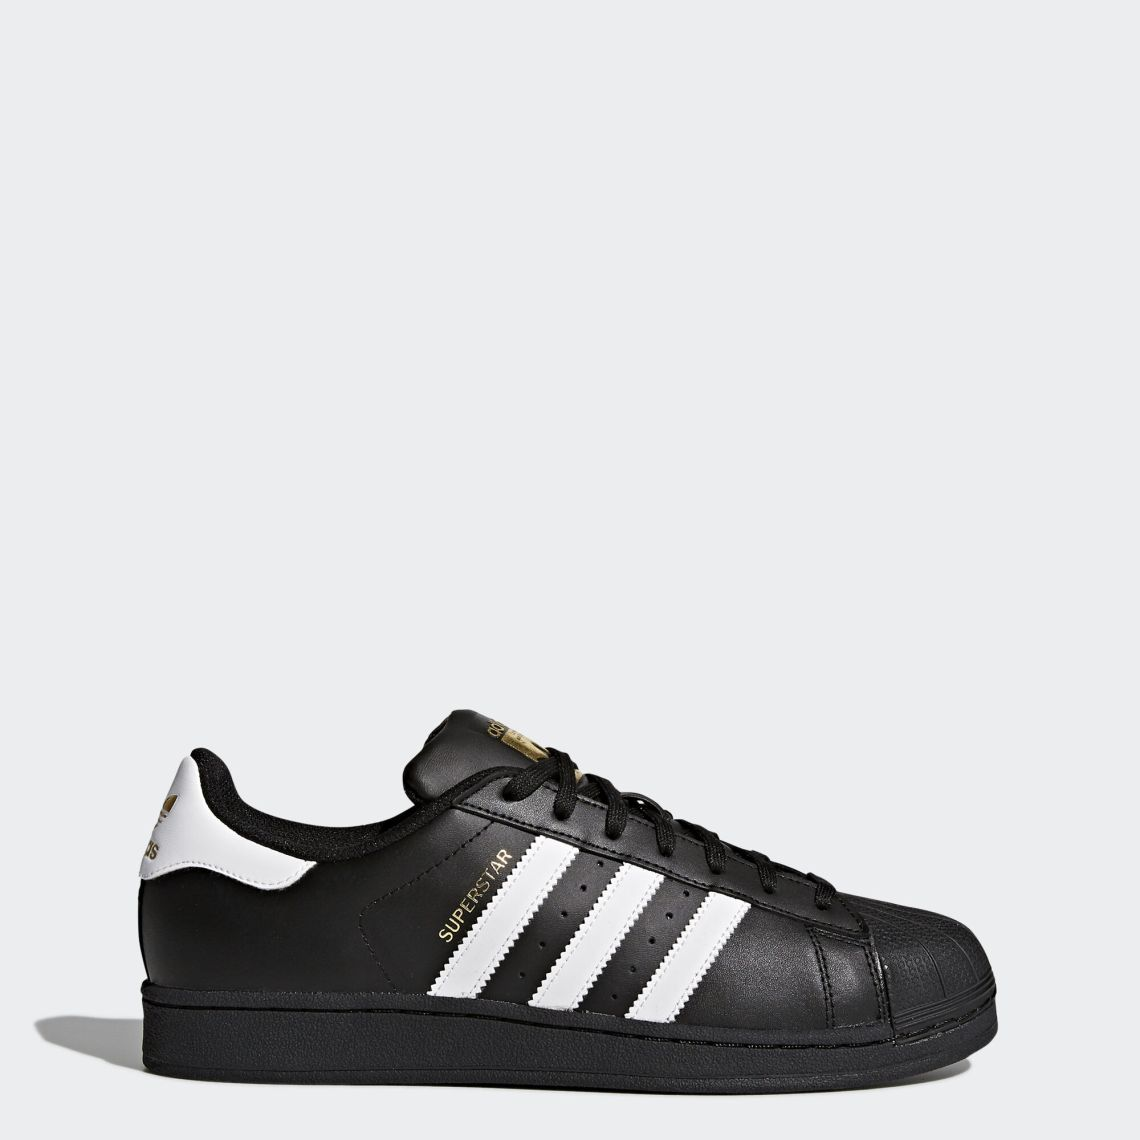 Pdg Adidas 6